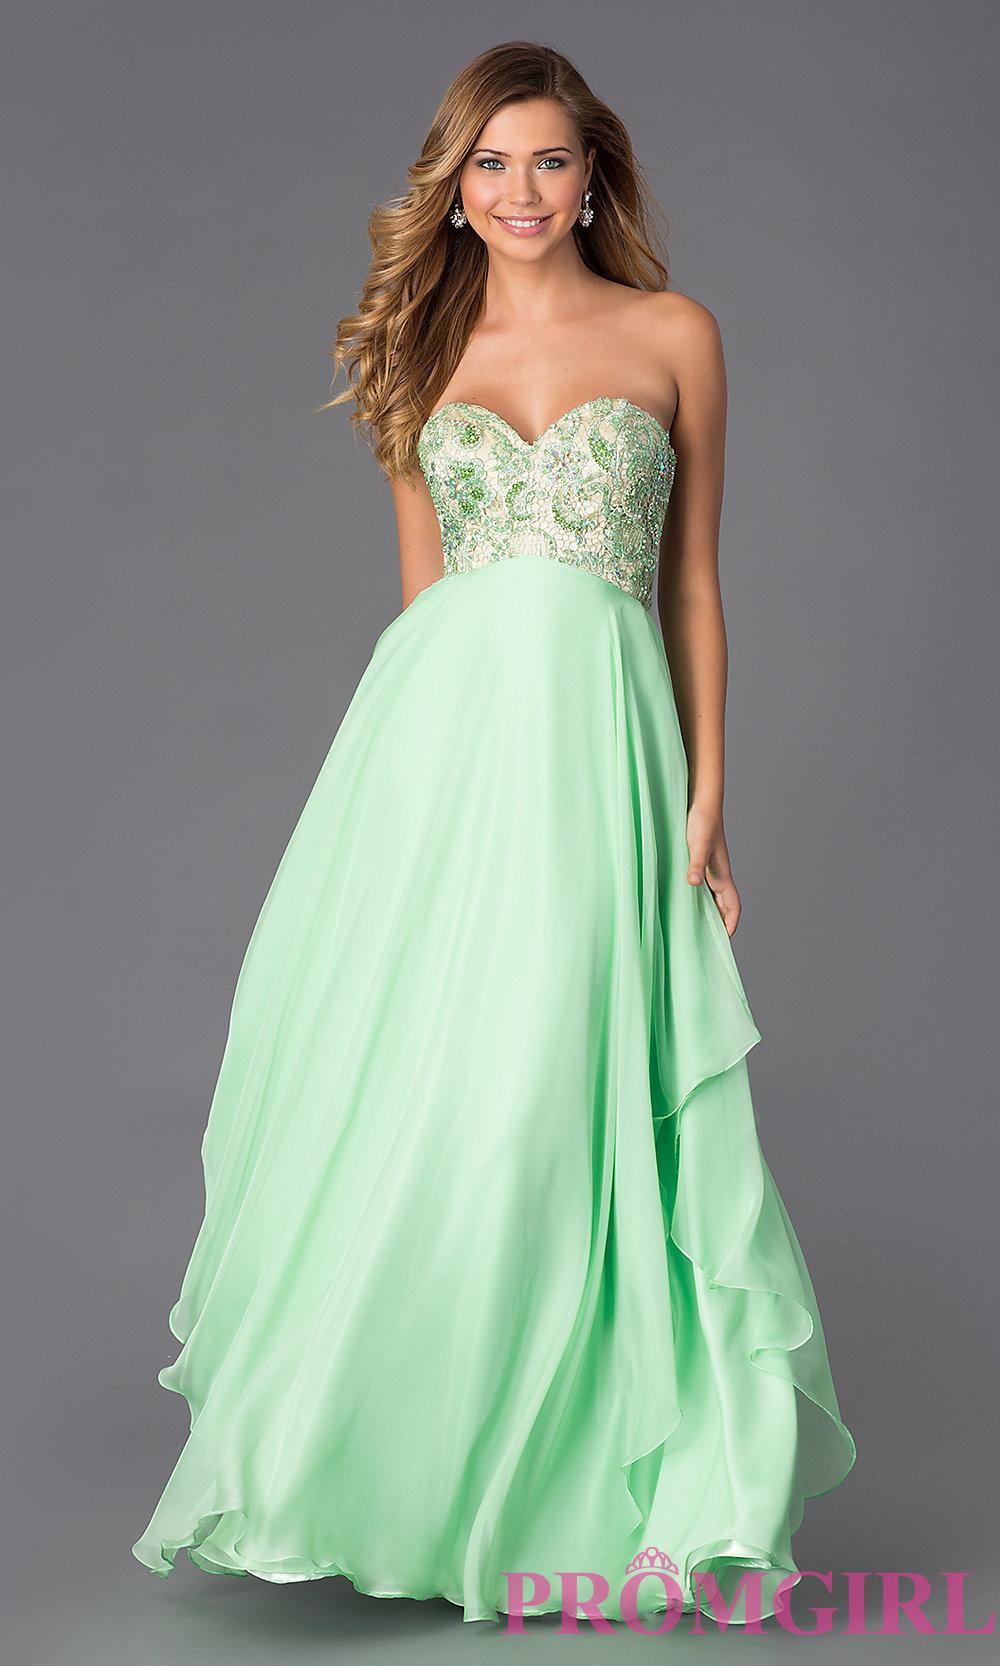 Empire waist prom dress by alyce paris al